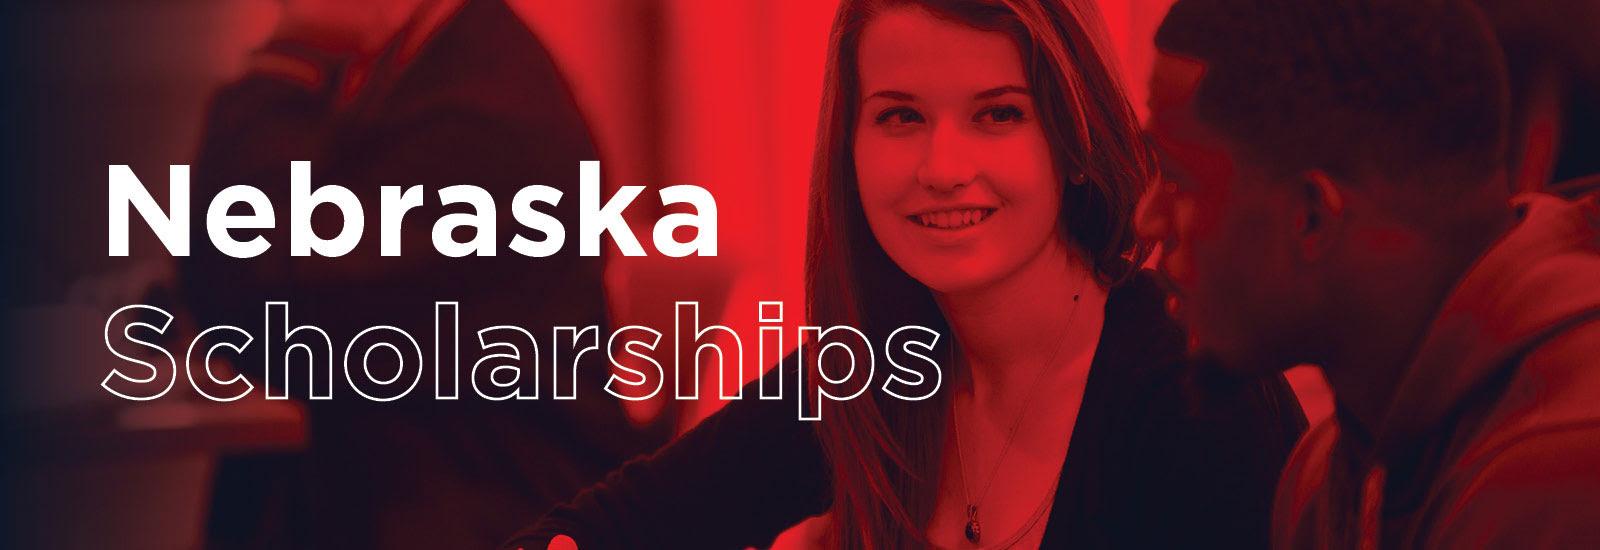 Nebraska Scholarship